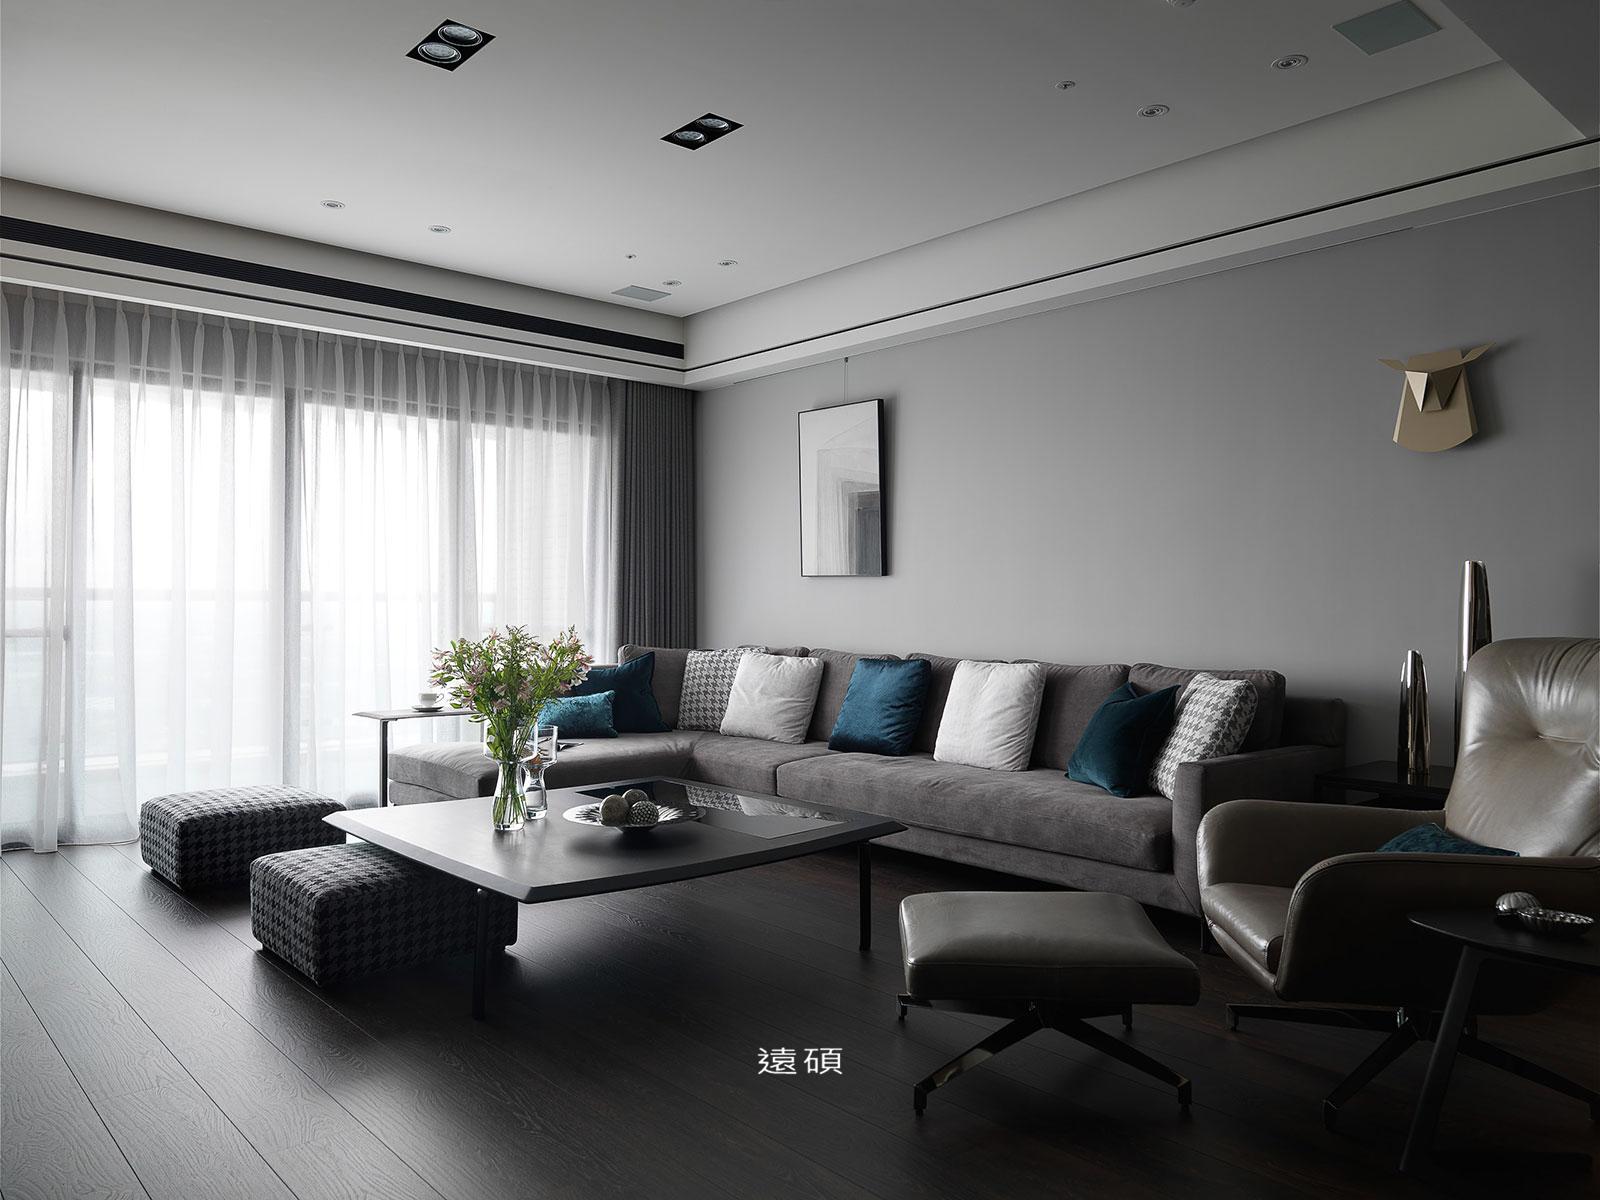 遠碩室內設計 YUAN SHUO DESIGN